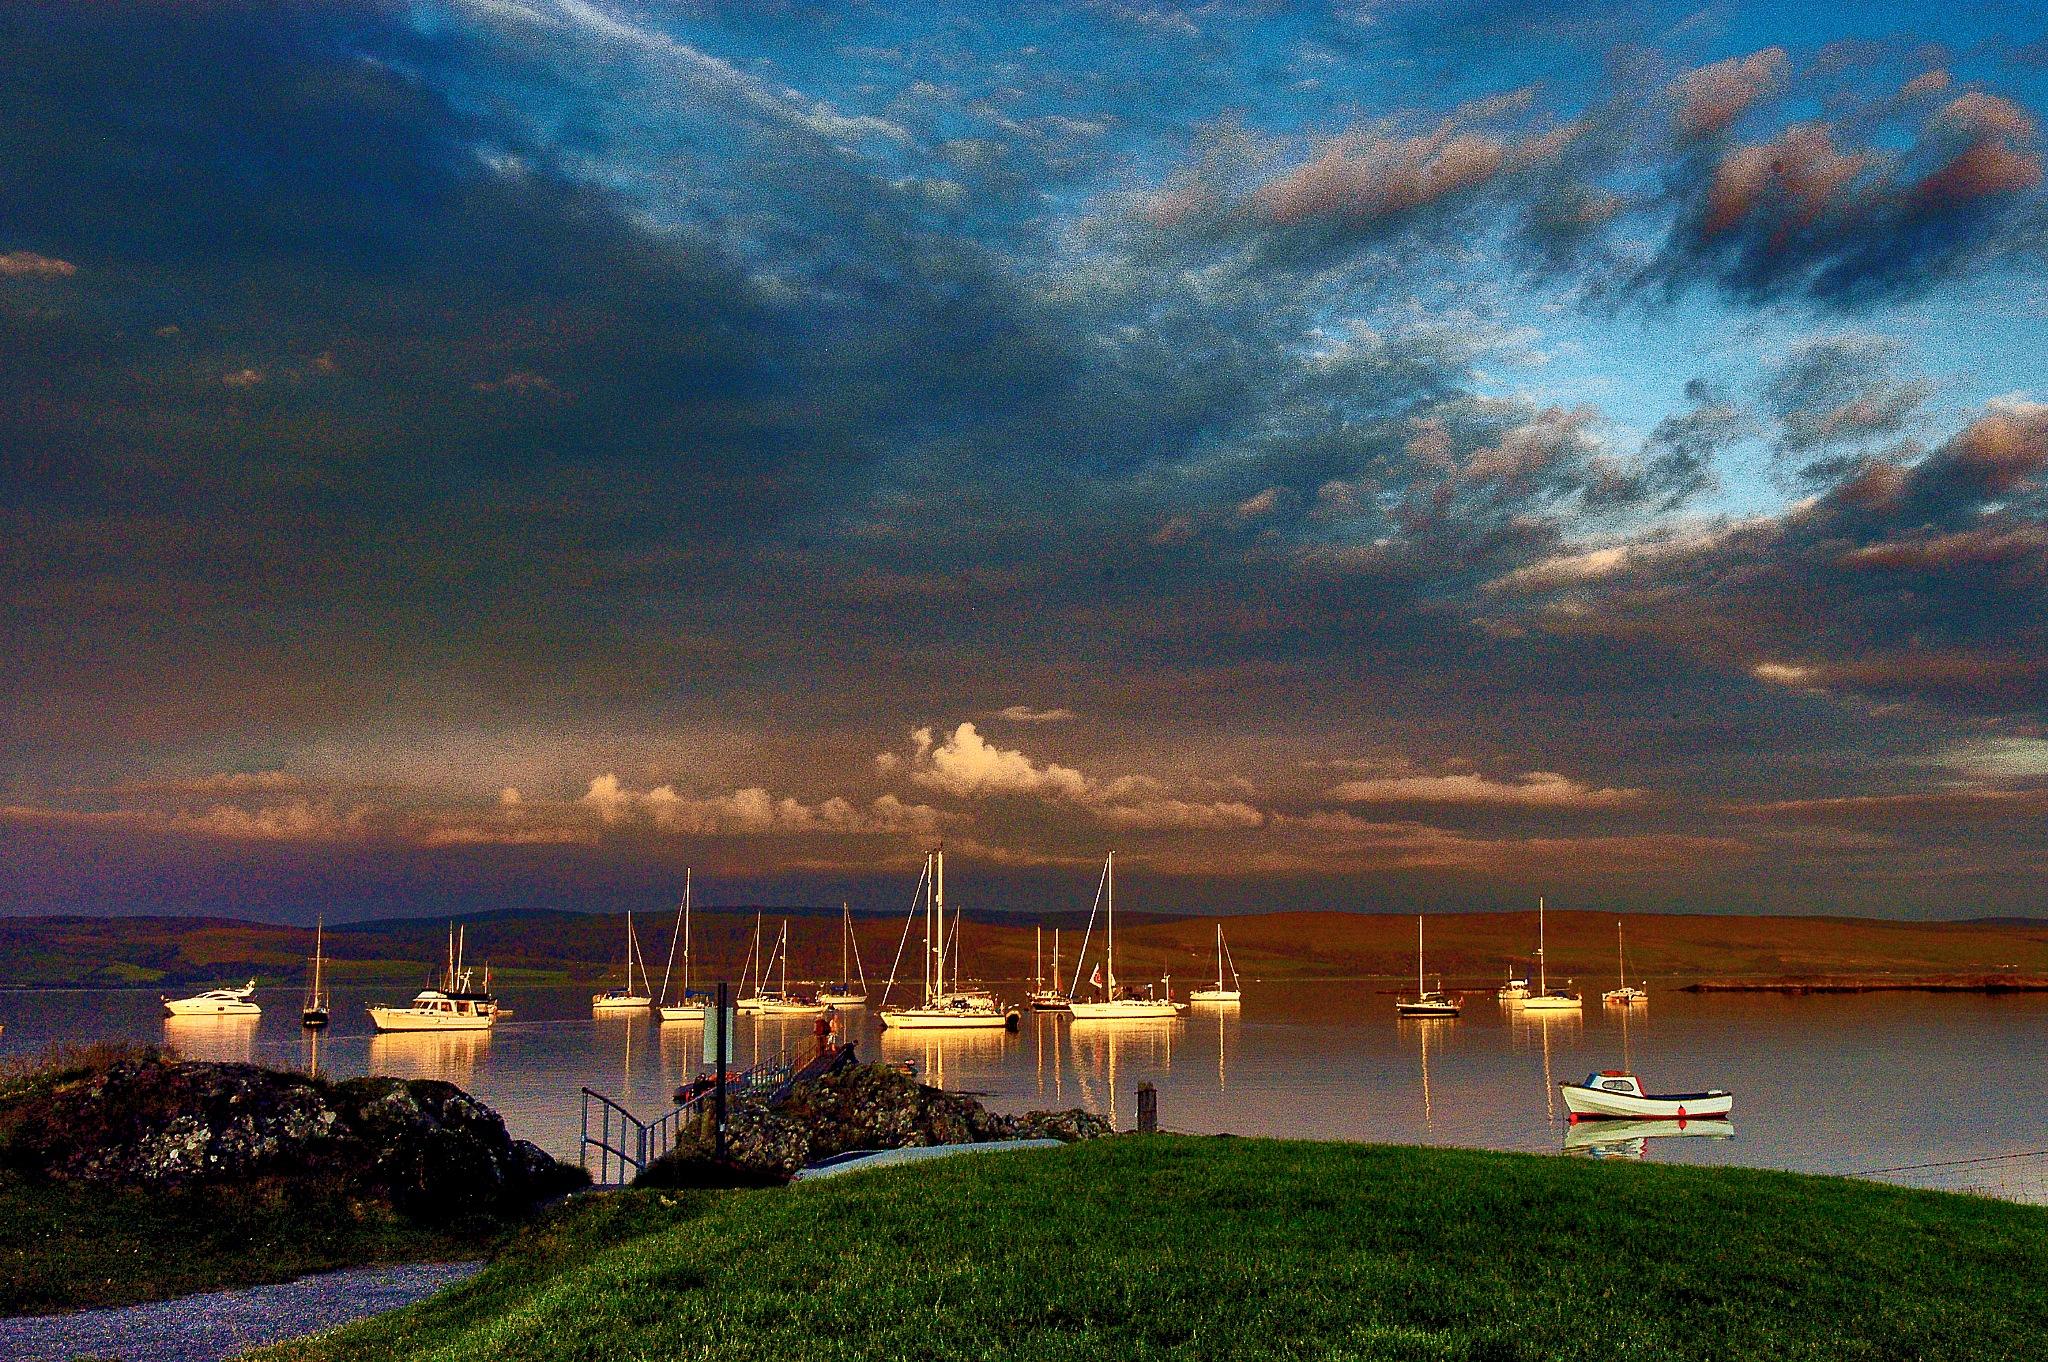 Sunset Glow by PeterMChambers